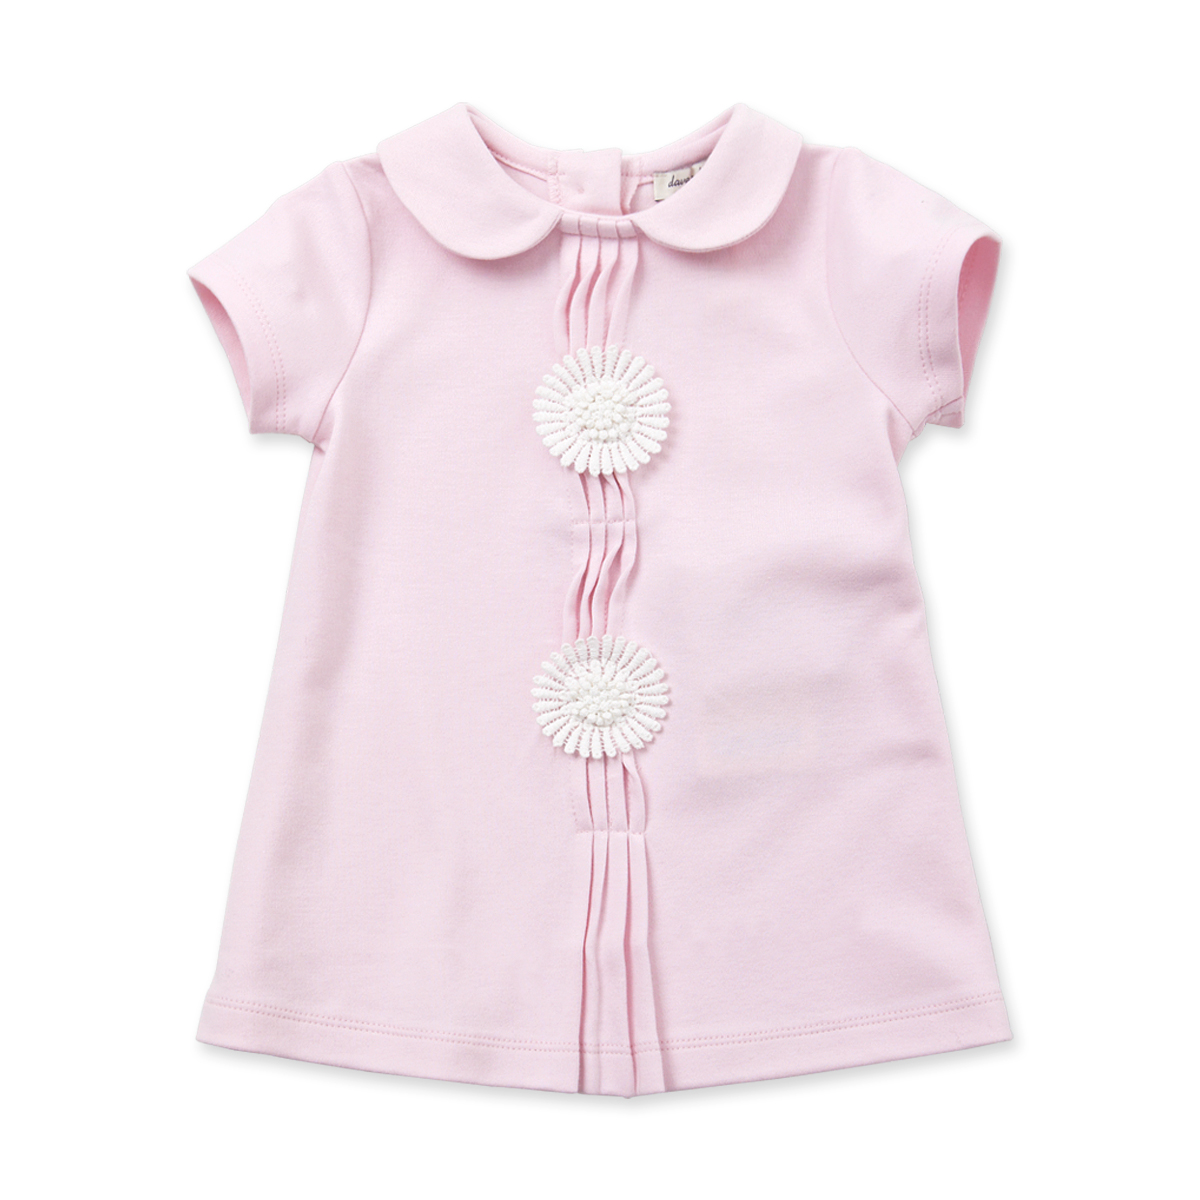 davebella戴維貝拉 女童連衣裙 女寶寶 短袖裙子 公主裙XS